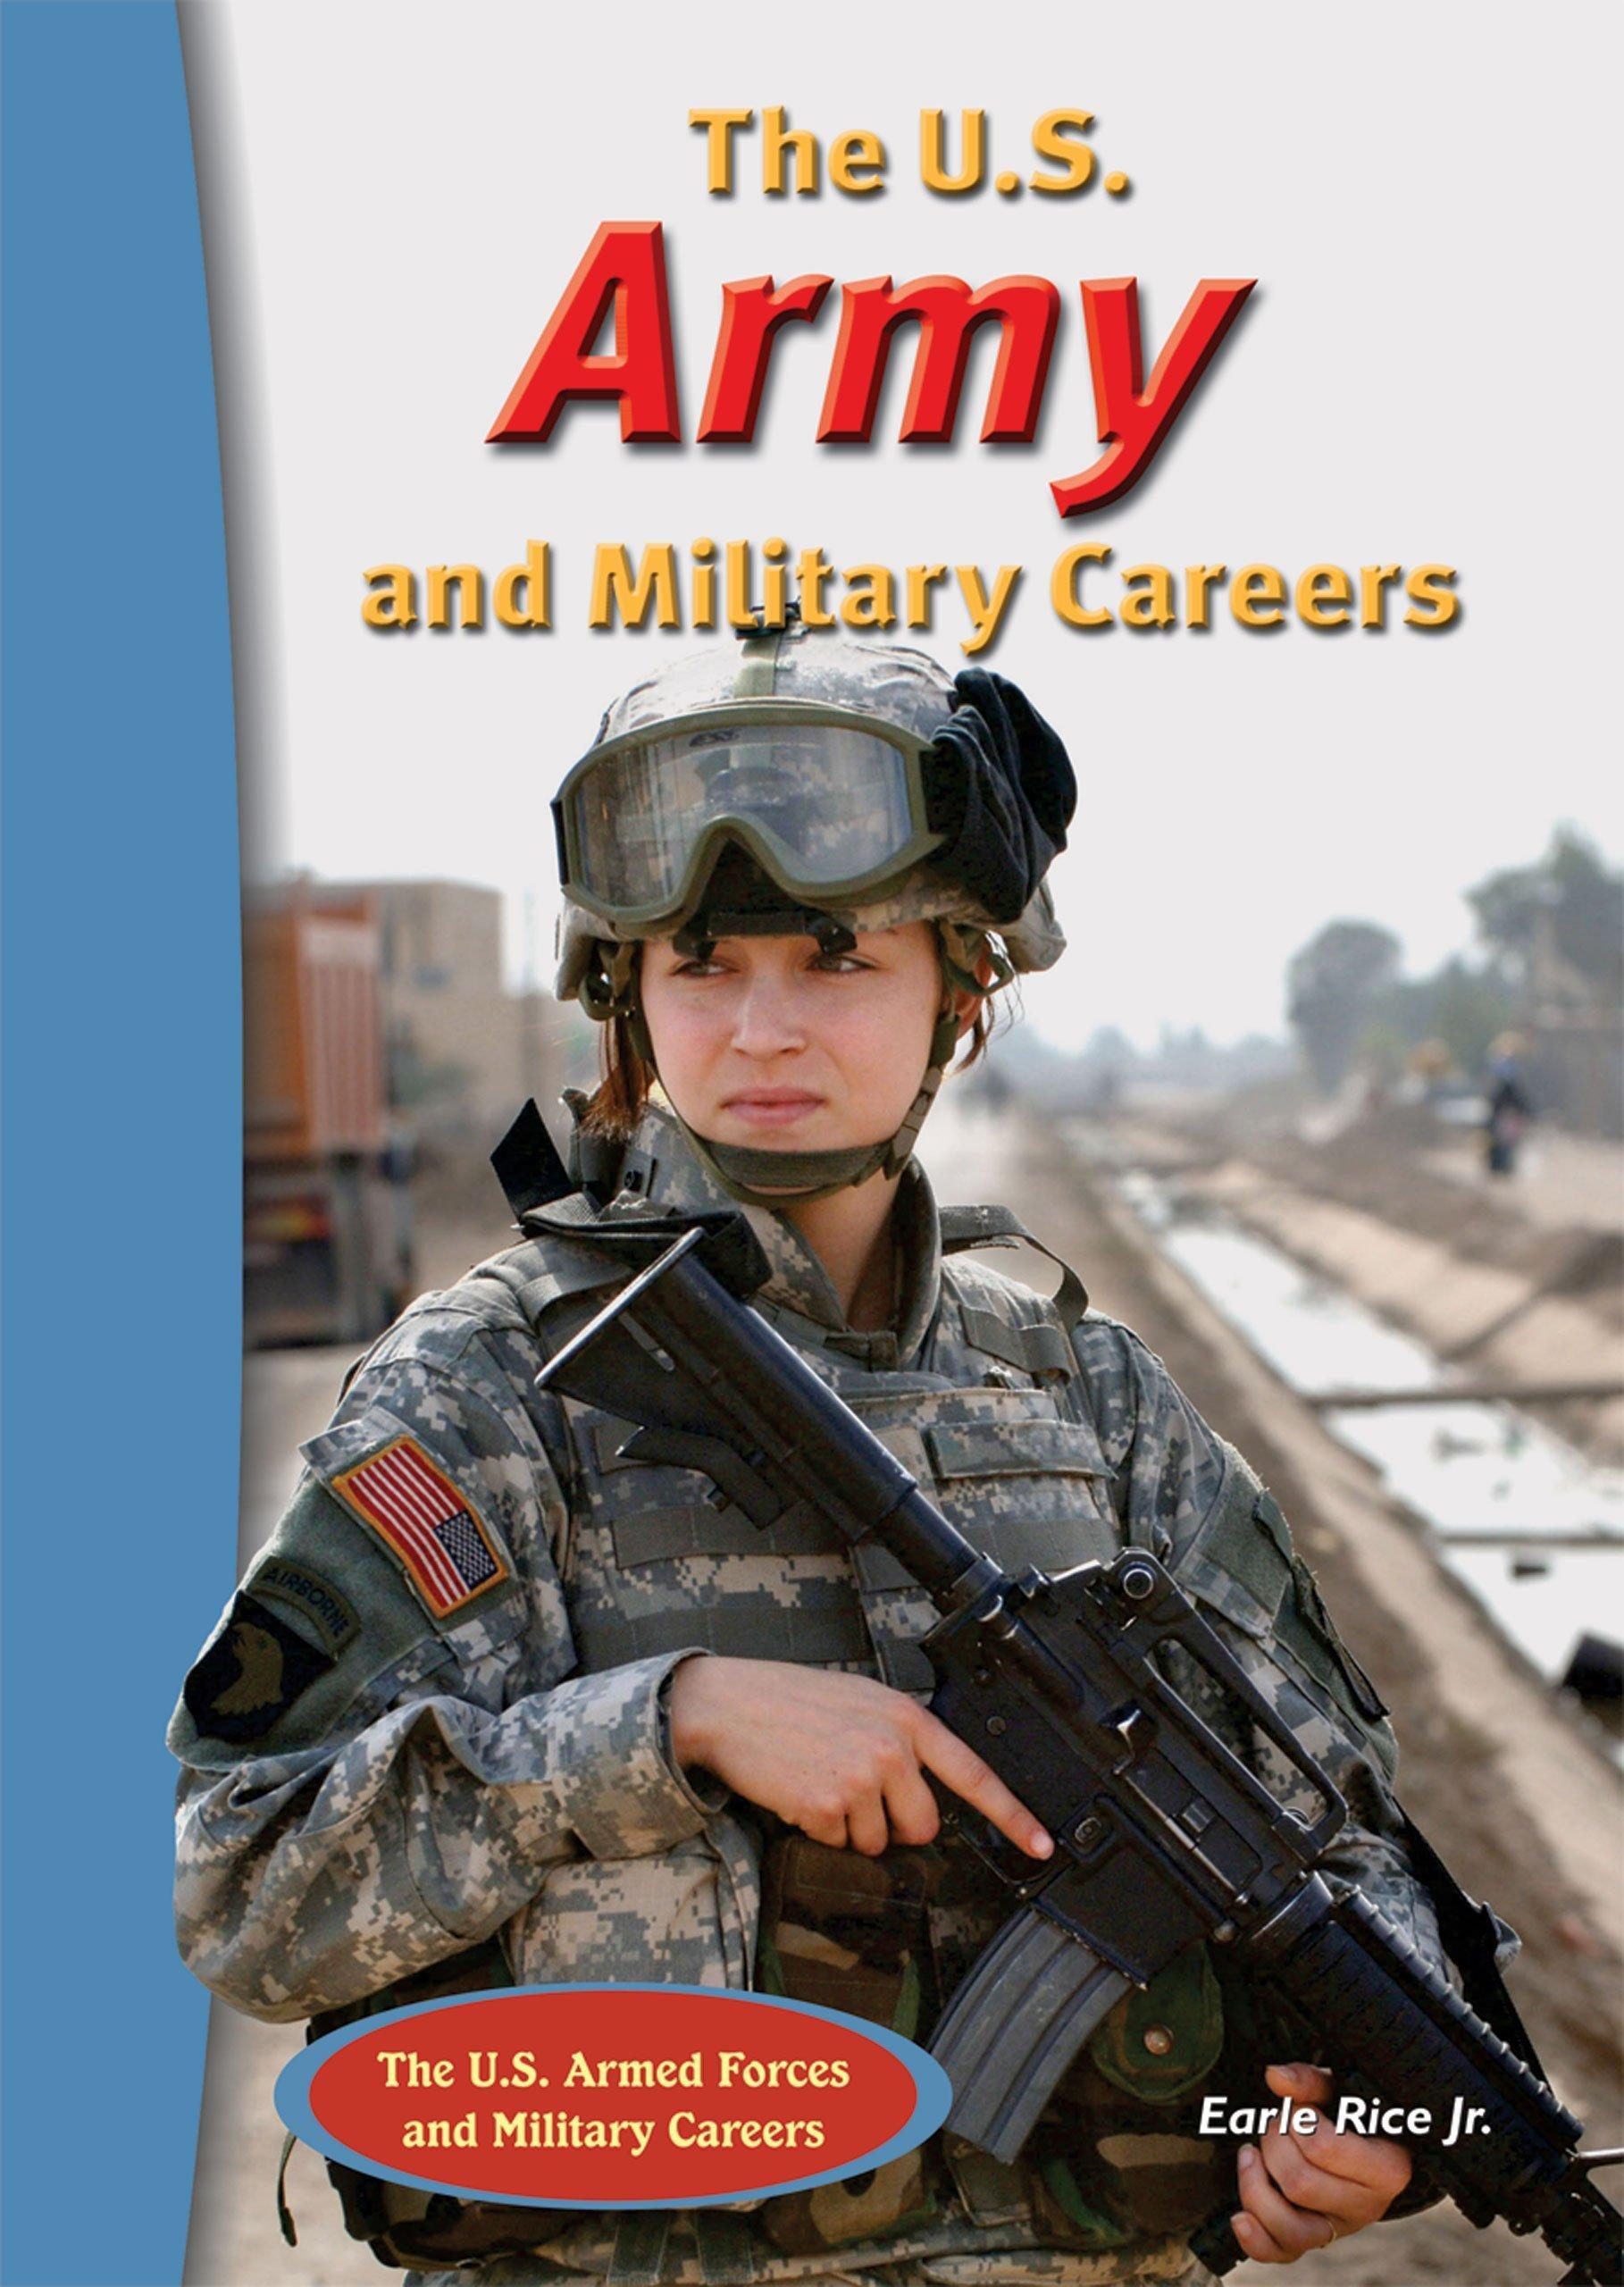 The U.S. Army and Military Careers (The U.S. Armed Forces and Military Careers) PDF